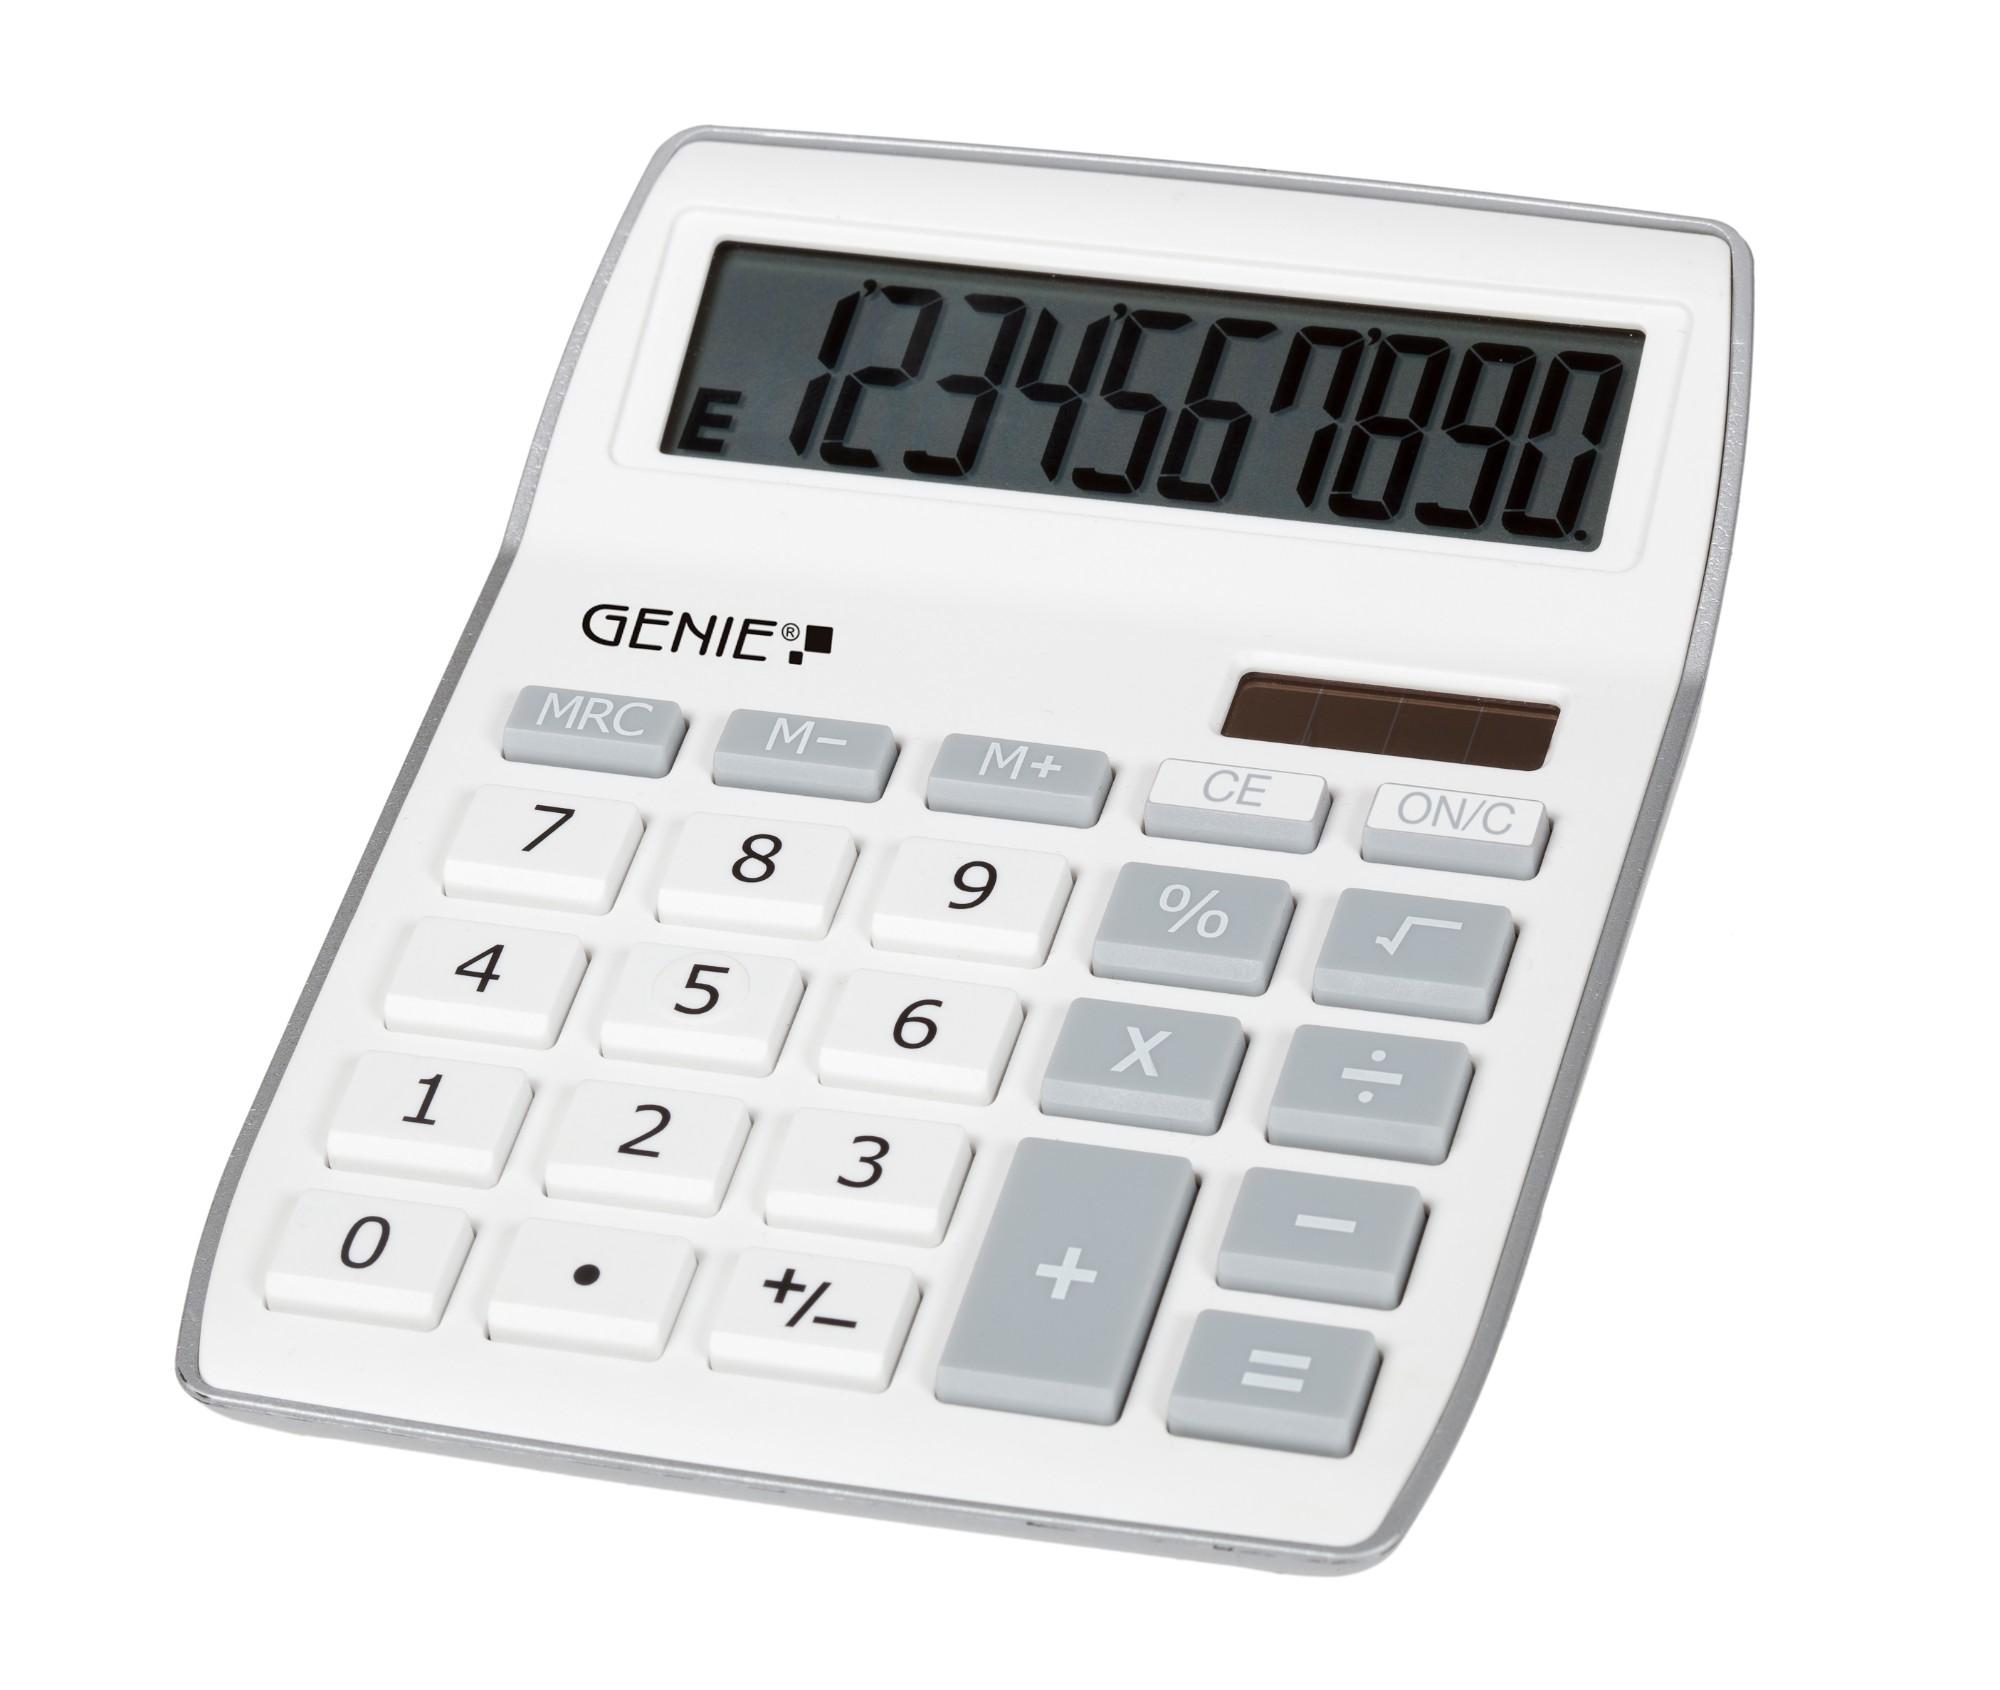 Genie 840 S calculator Desktop Display Grey, White